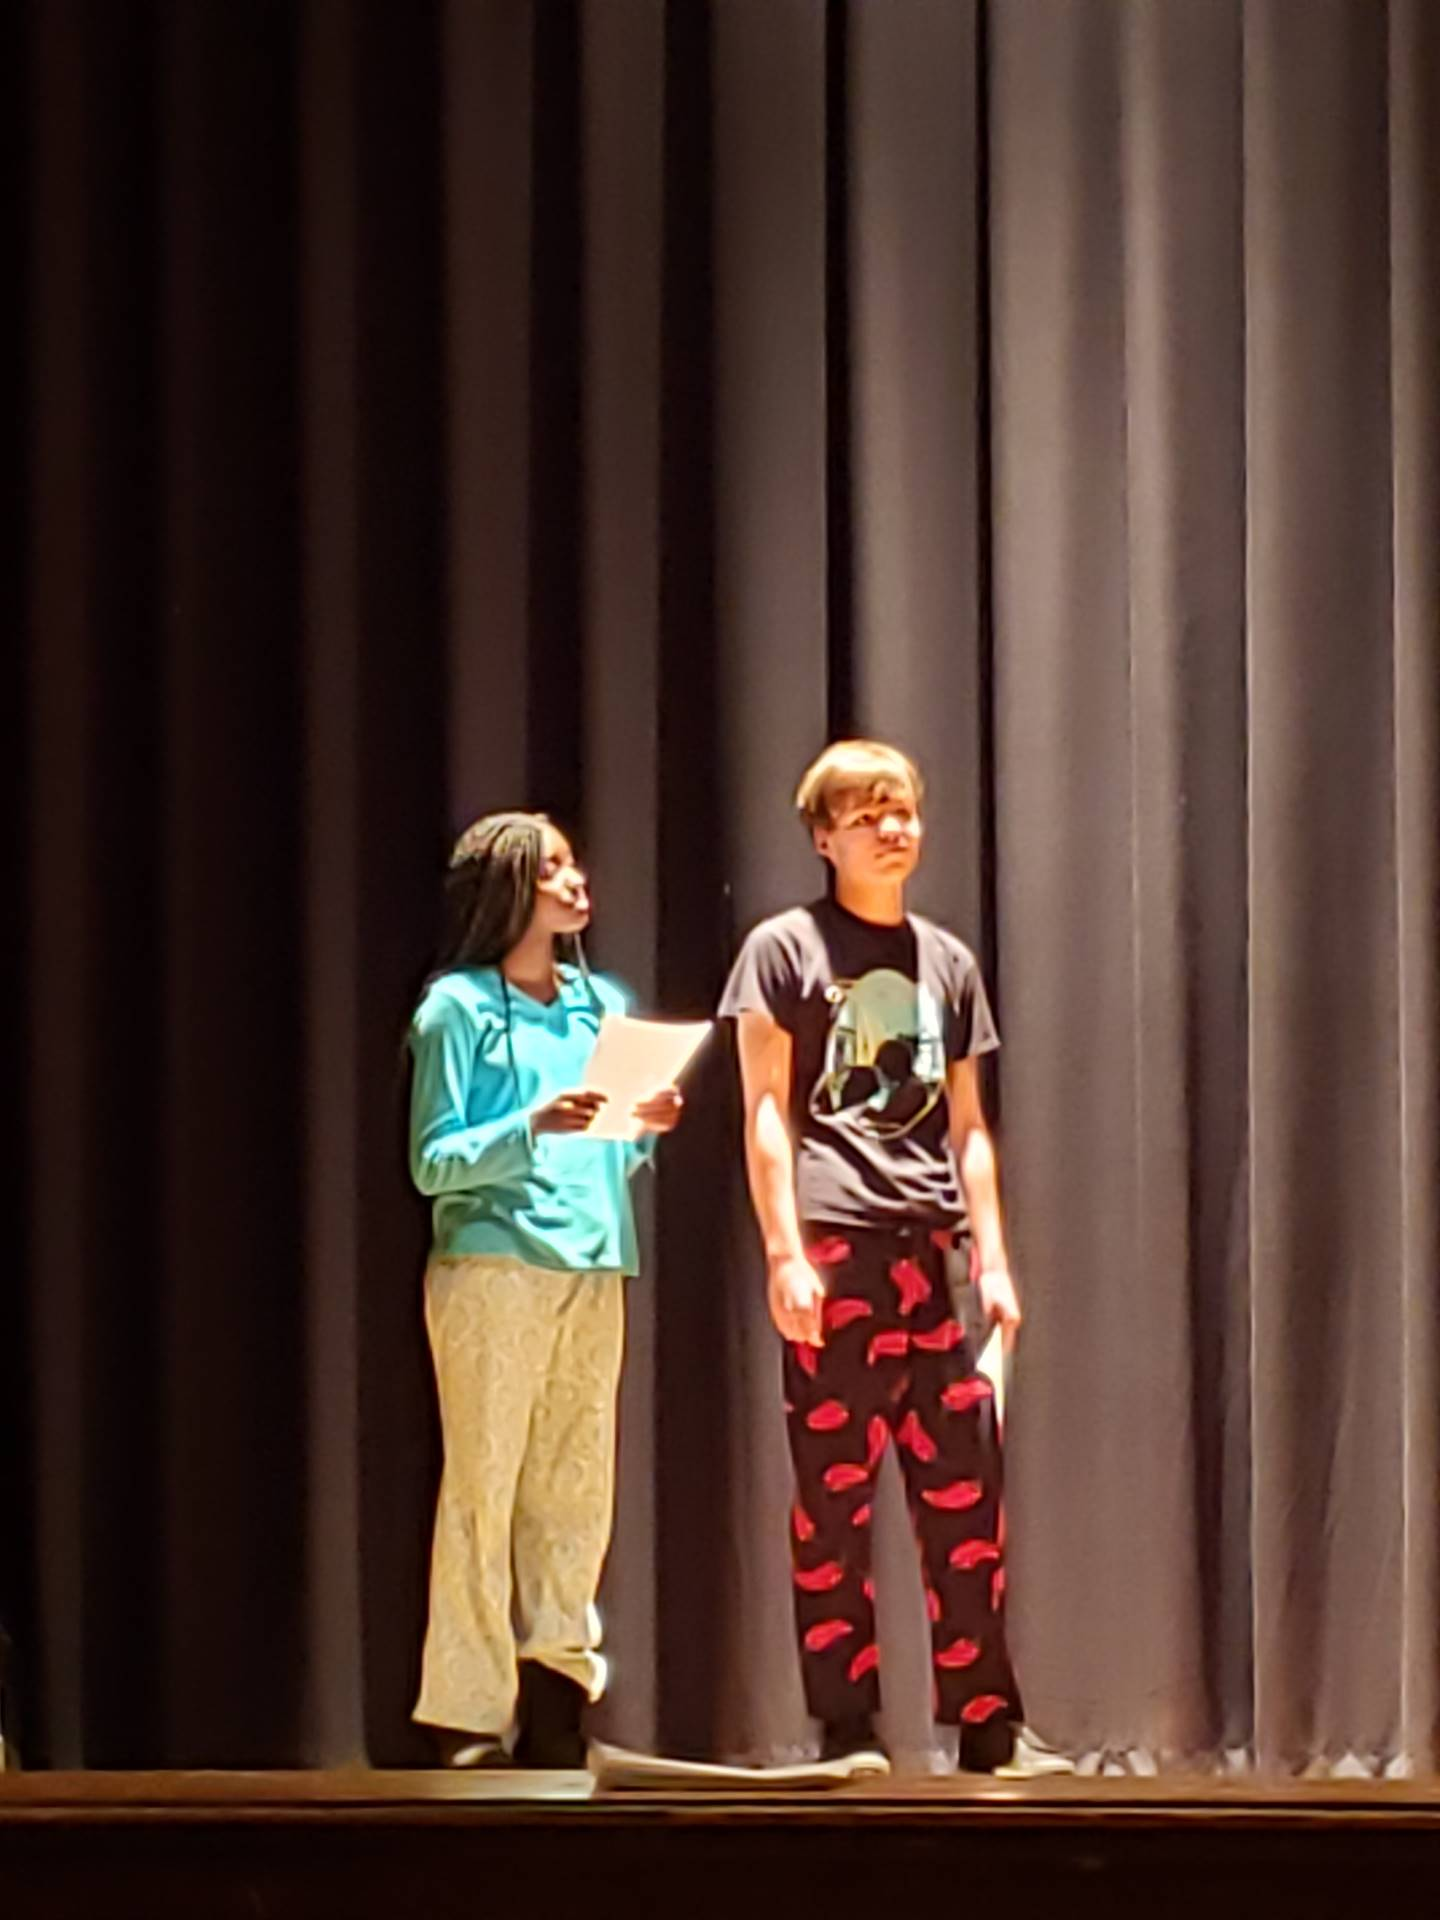 Theatre Arts Students Partake in Partner Scene Work